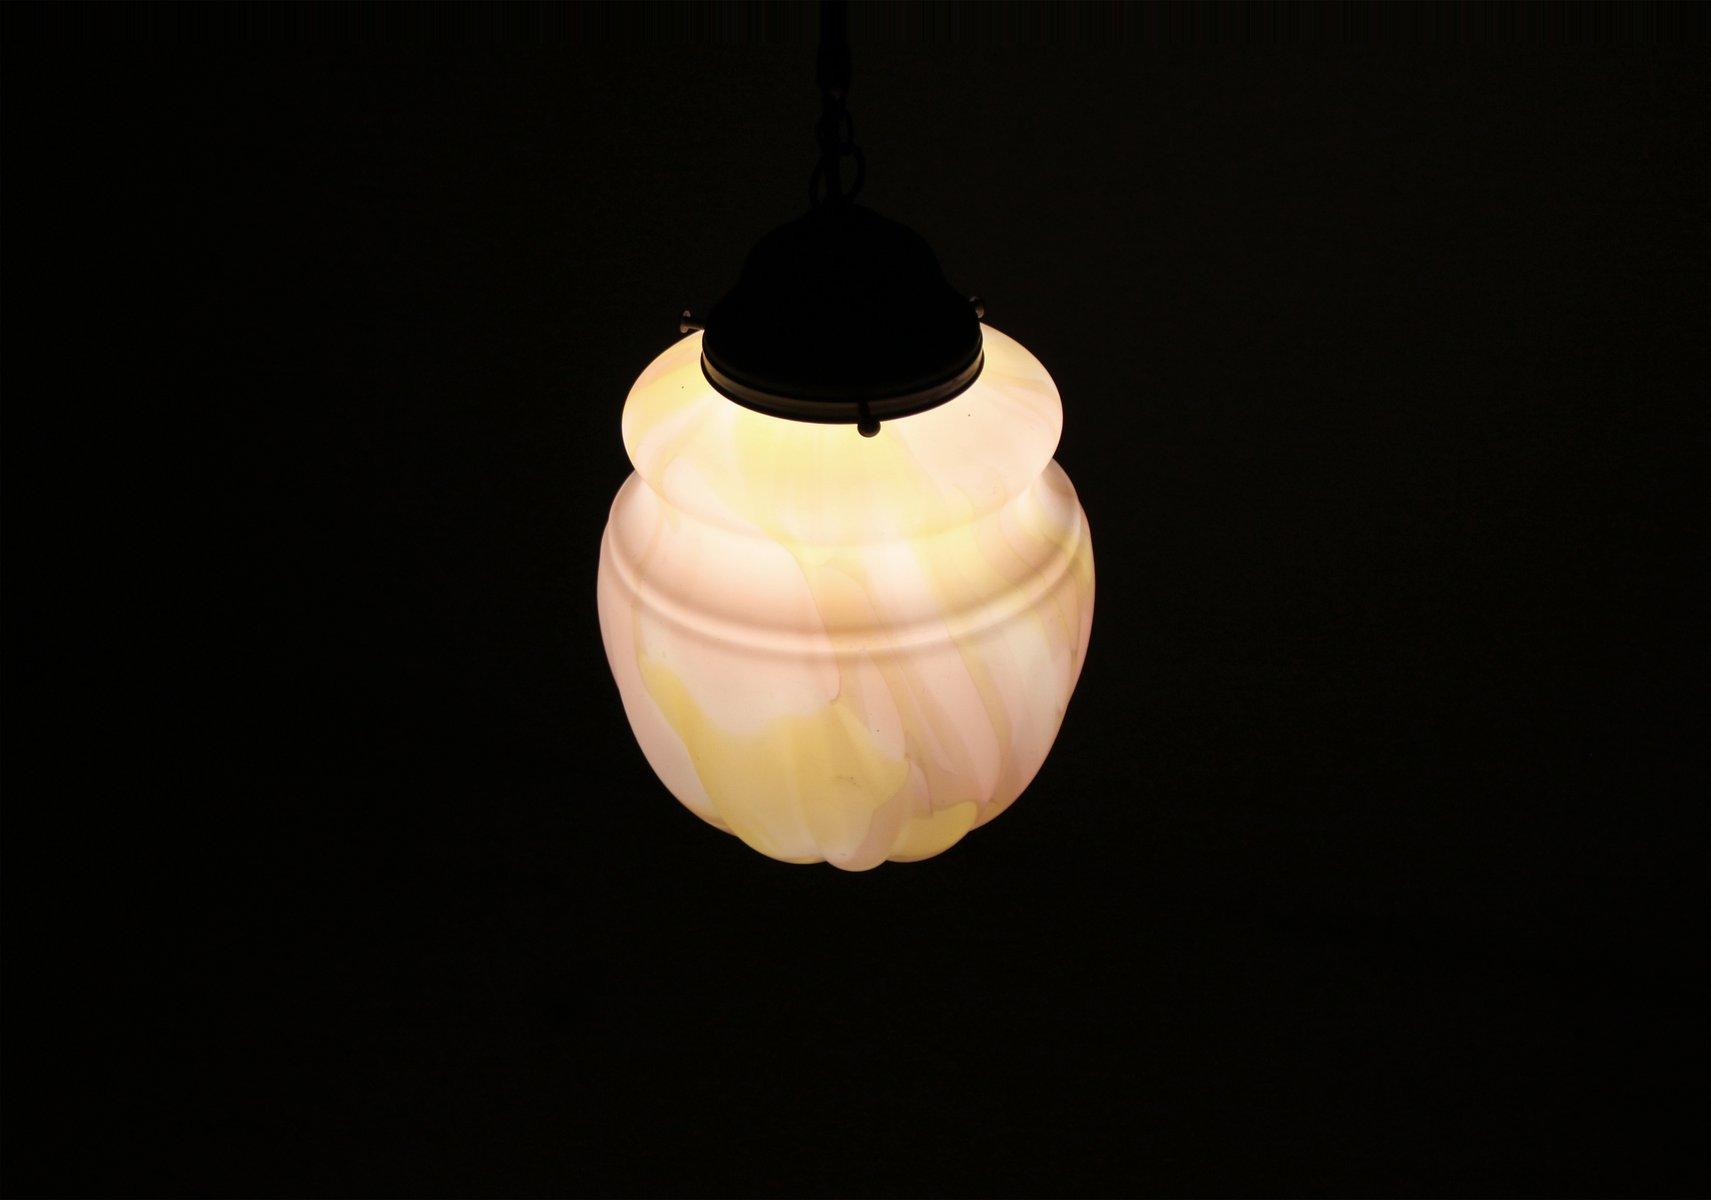 art baccarat chandelier antique deco light ceiling crystal chandeliers image period ceilings